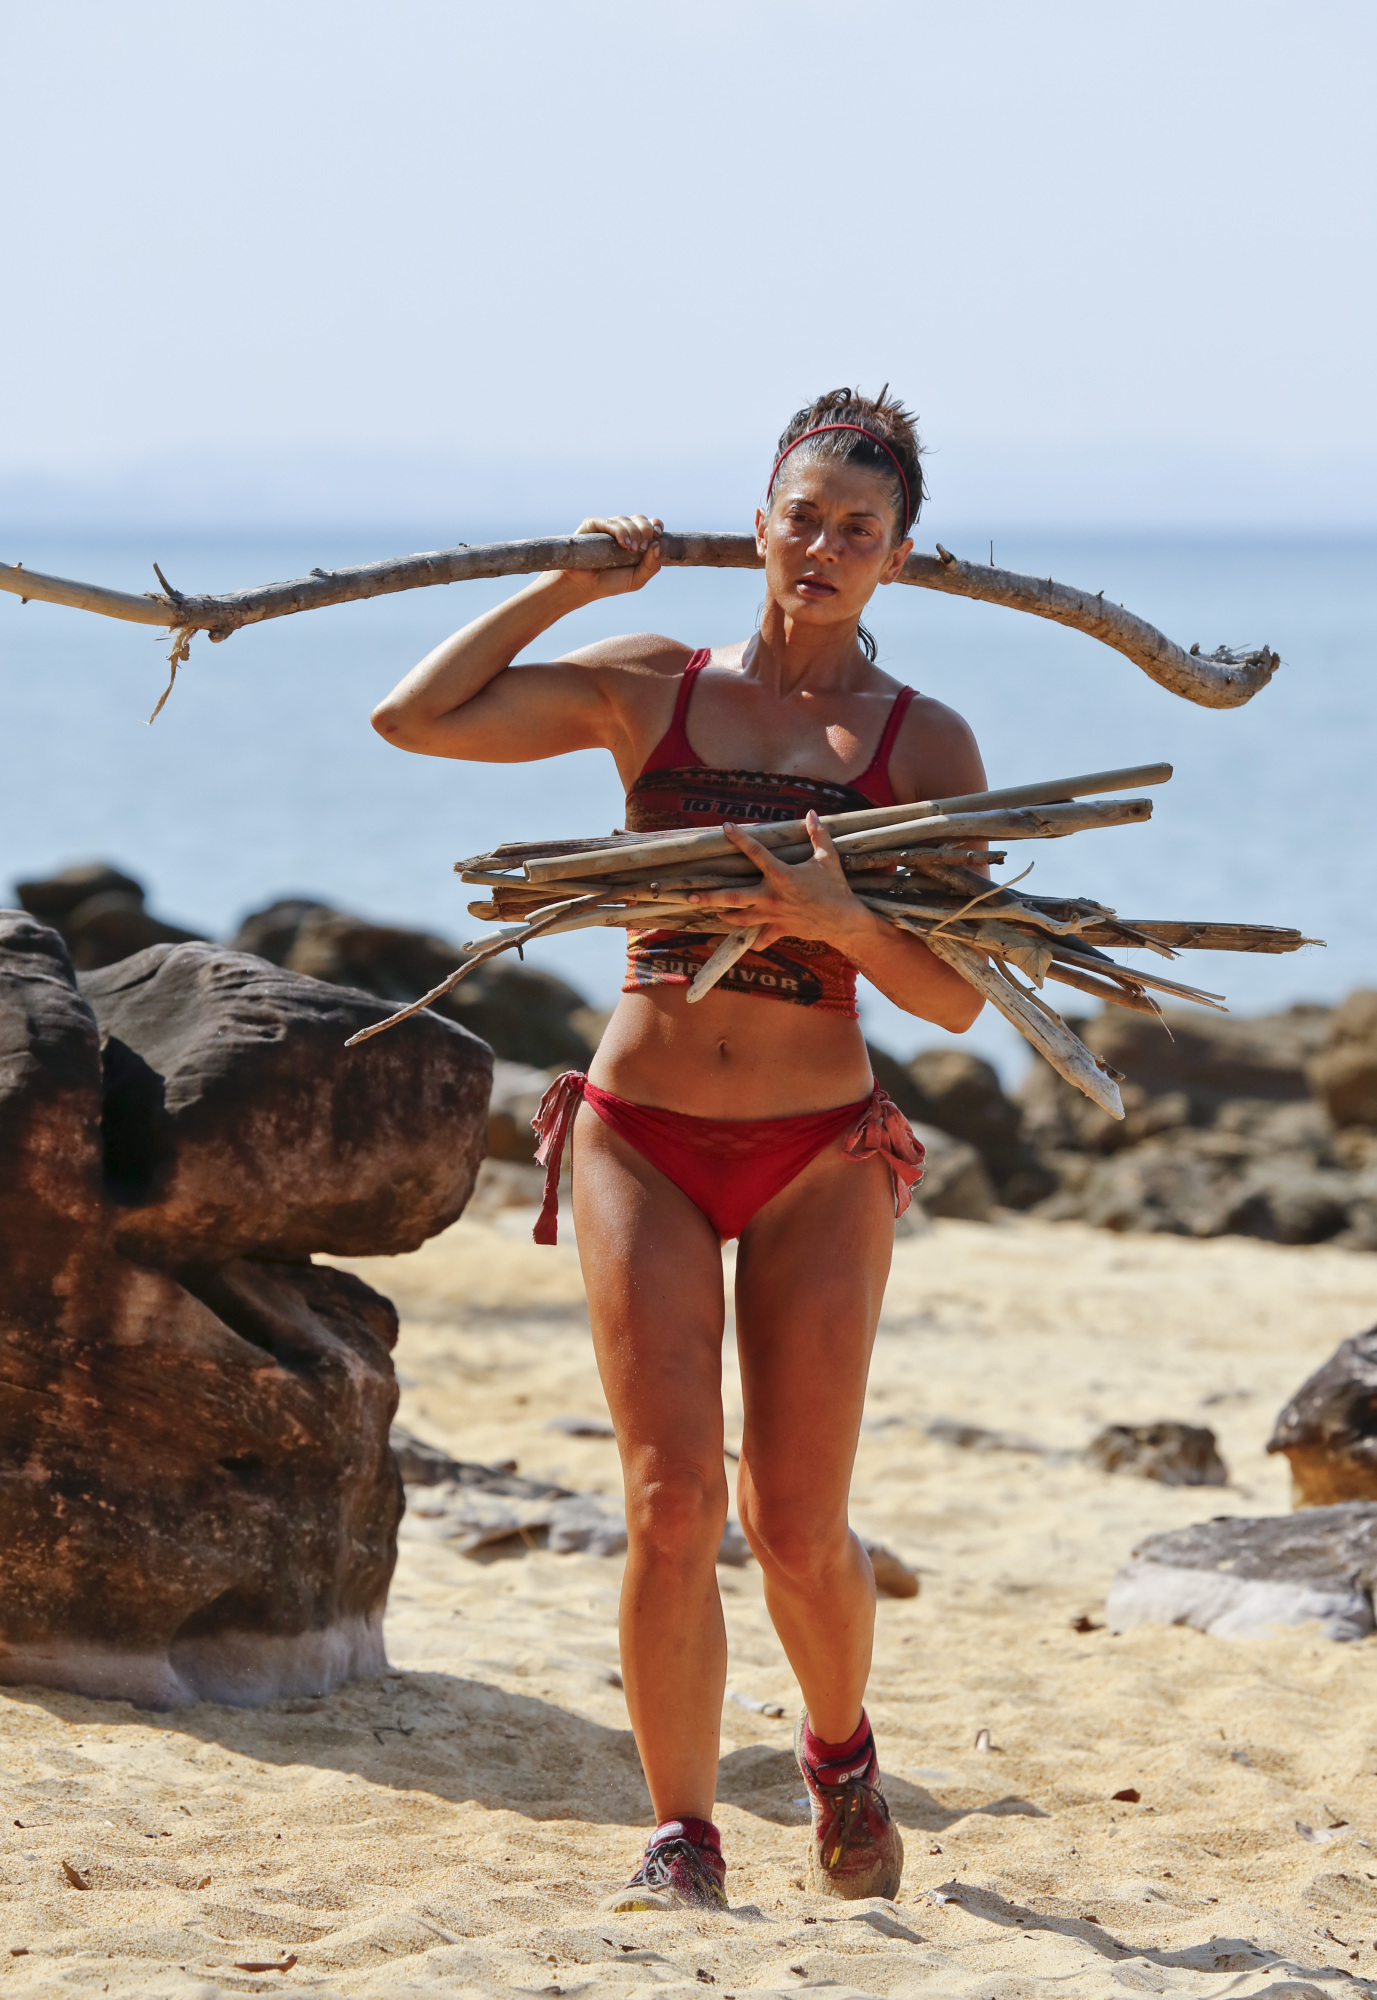 Jennifer Lanzetti works at Brawn camp on Survivor: Kaoh Rong